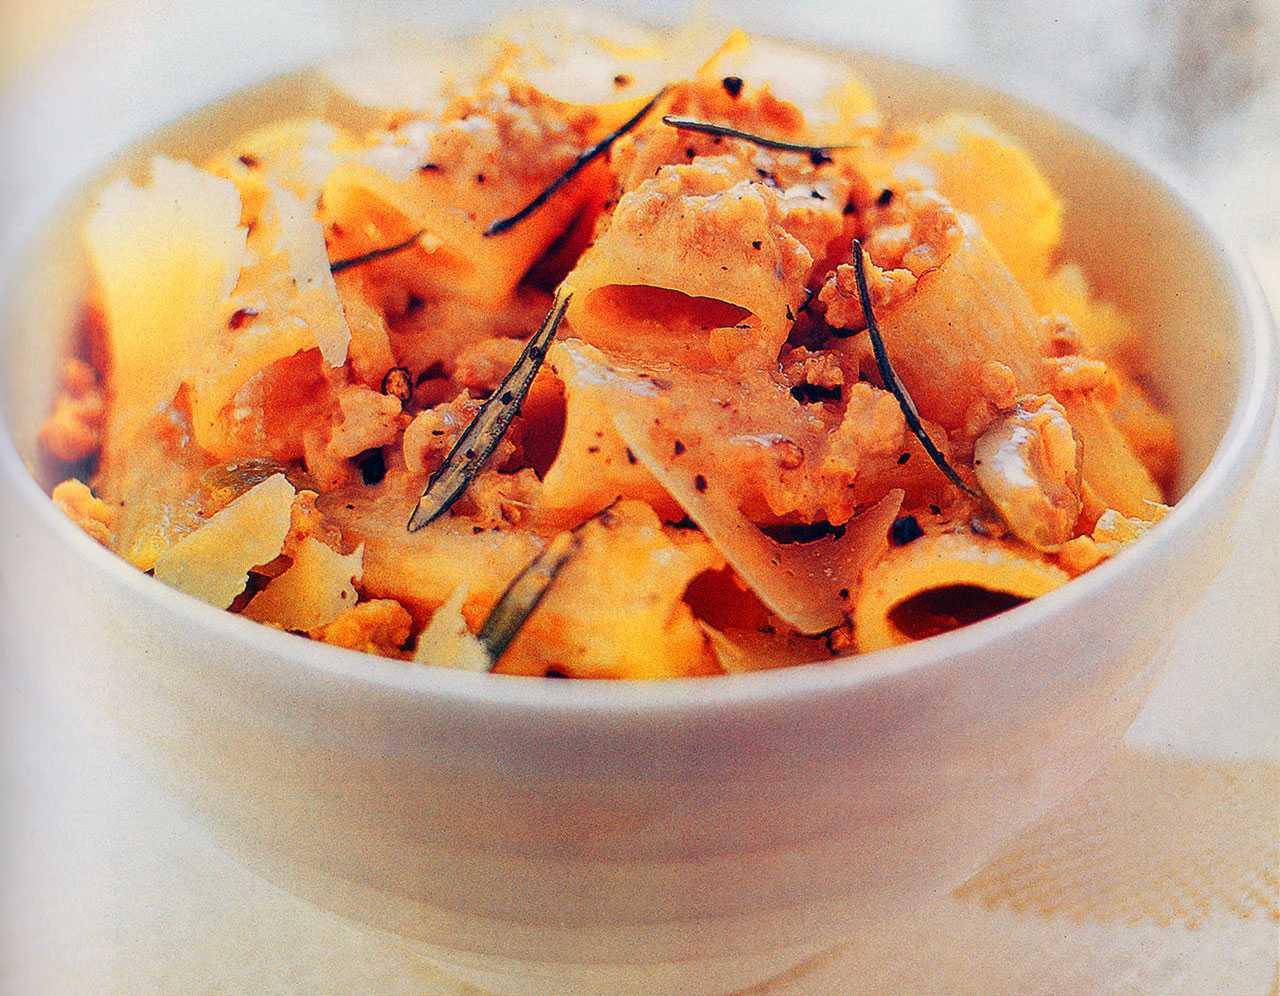 Sauce ragu bolognese pasta recipe-pork ragu pasta recipes